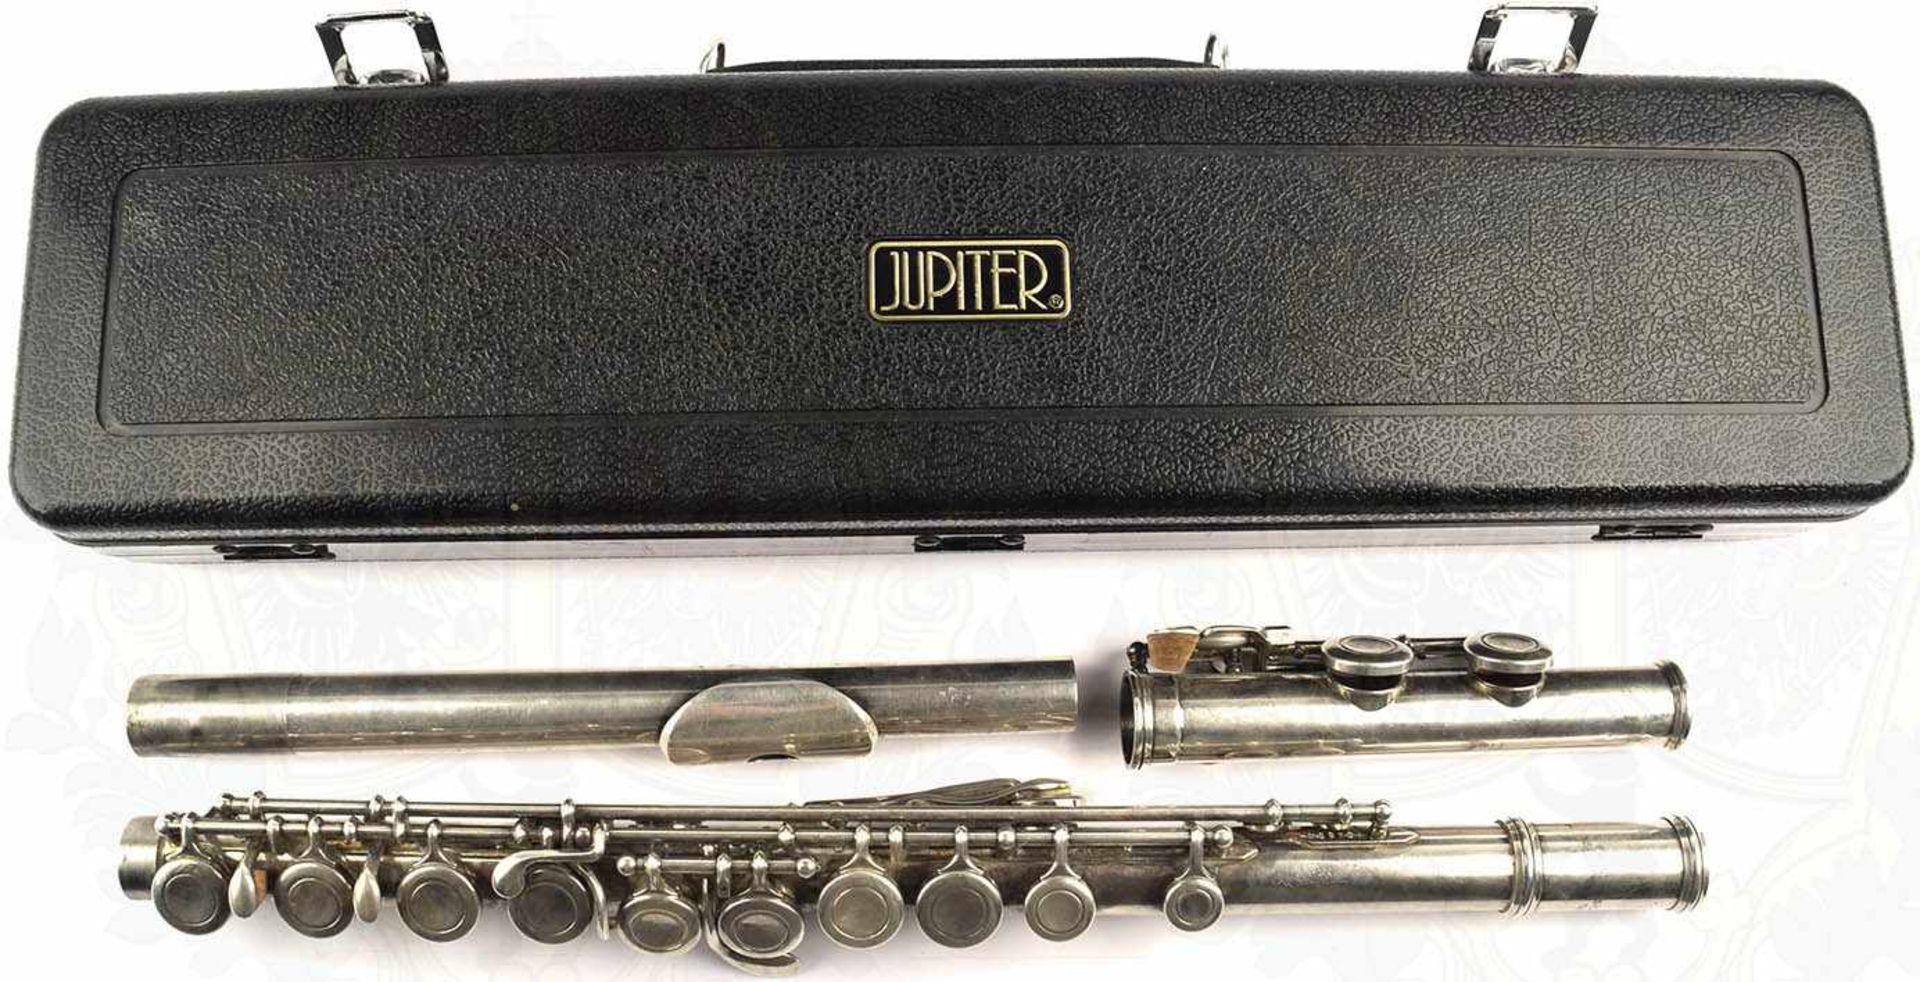 "QUERFLÖTE, Leichtmetall/vernickelt, m. Kopf-, Mittel u. Fußstück, Herst. ""Jupiter"", K.H.S. Musical - Bild 2 aus 4"